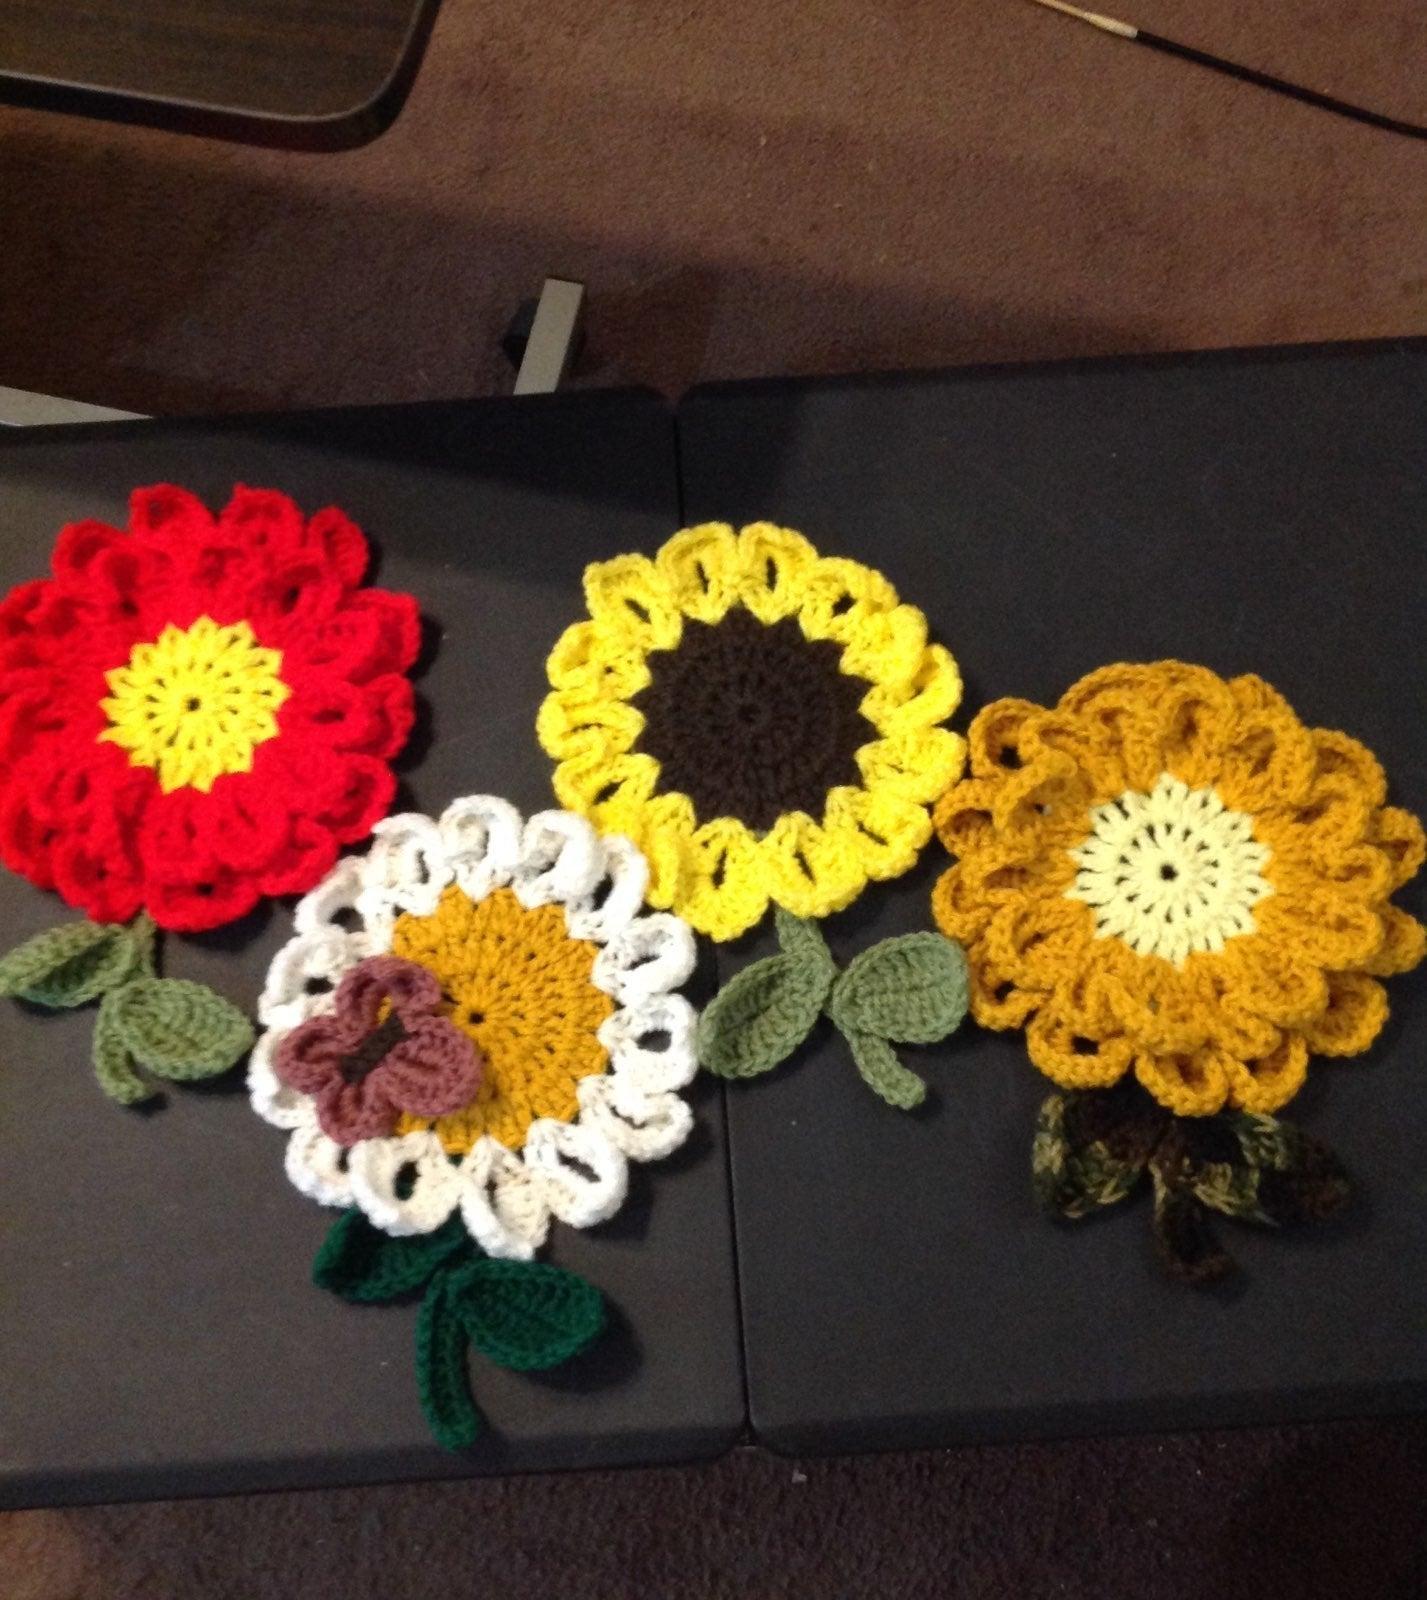 Decorative Crocheted Pot Holders